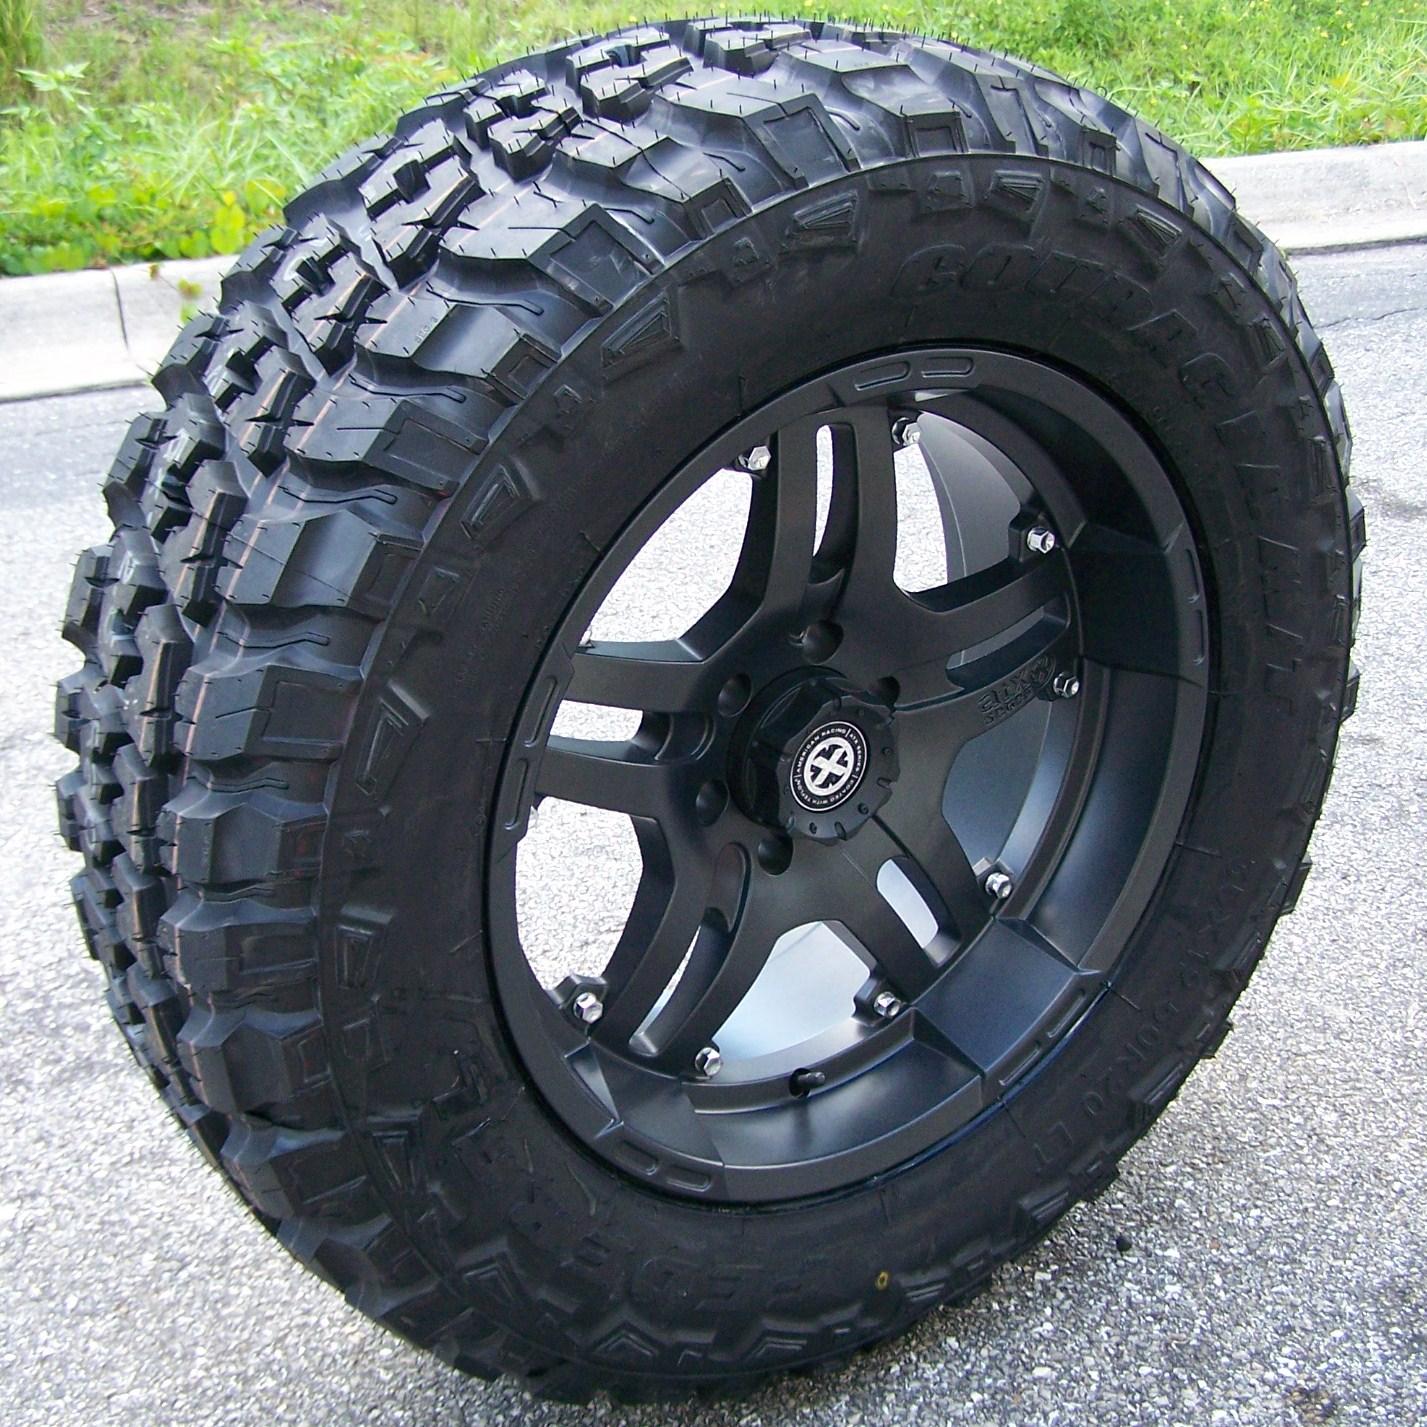 20 ATX Artillery Wheels Rims 33 Federal Couragia Tires Chevy Tahoe